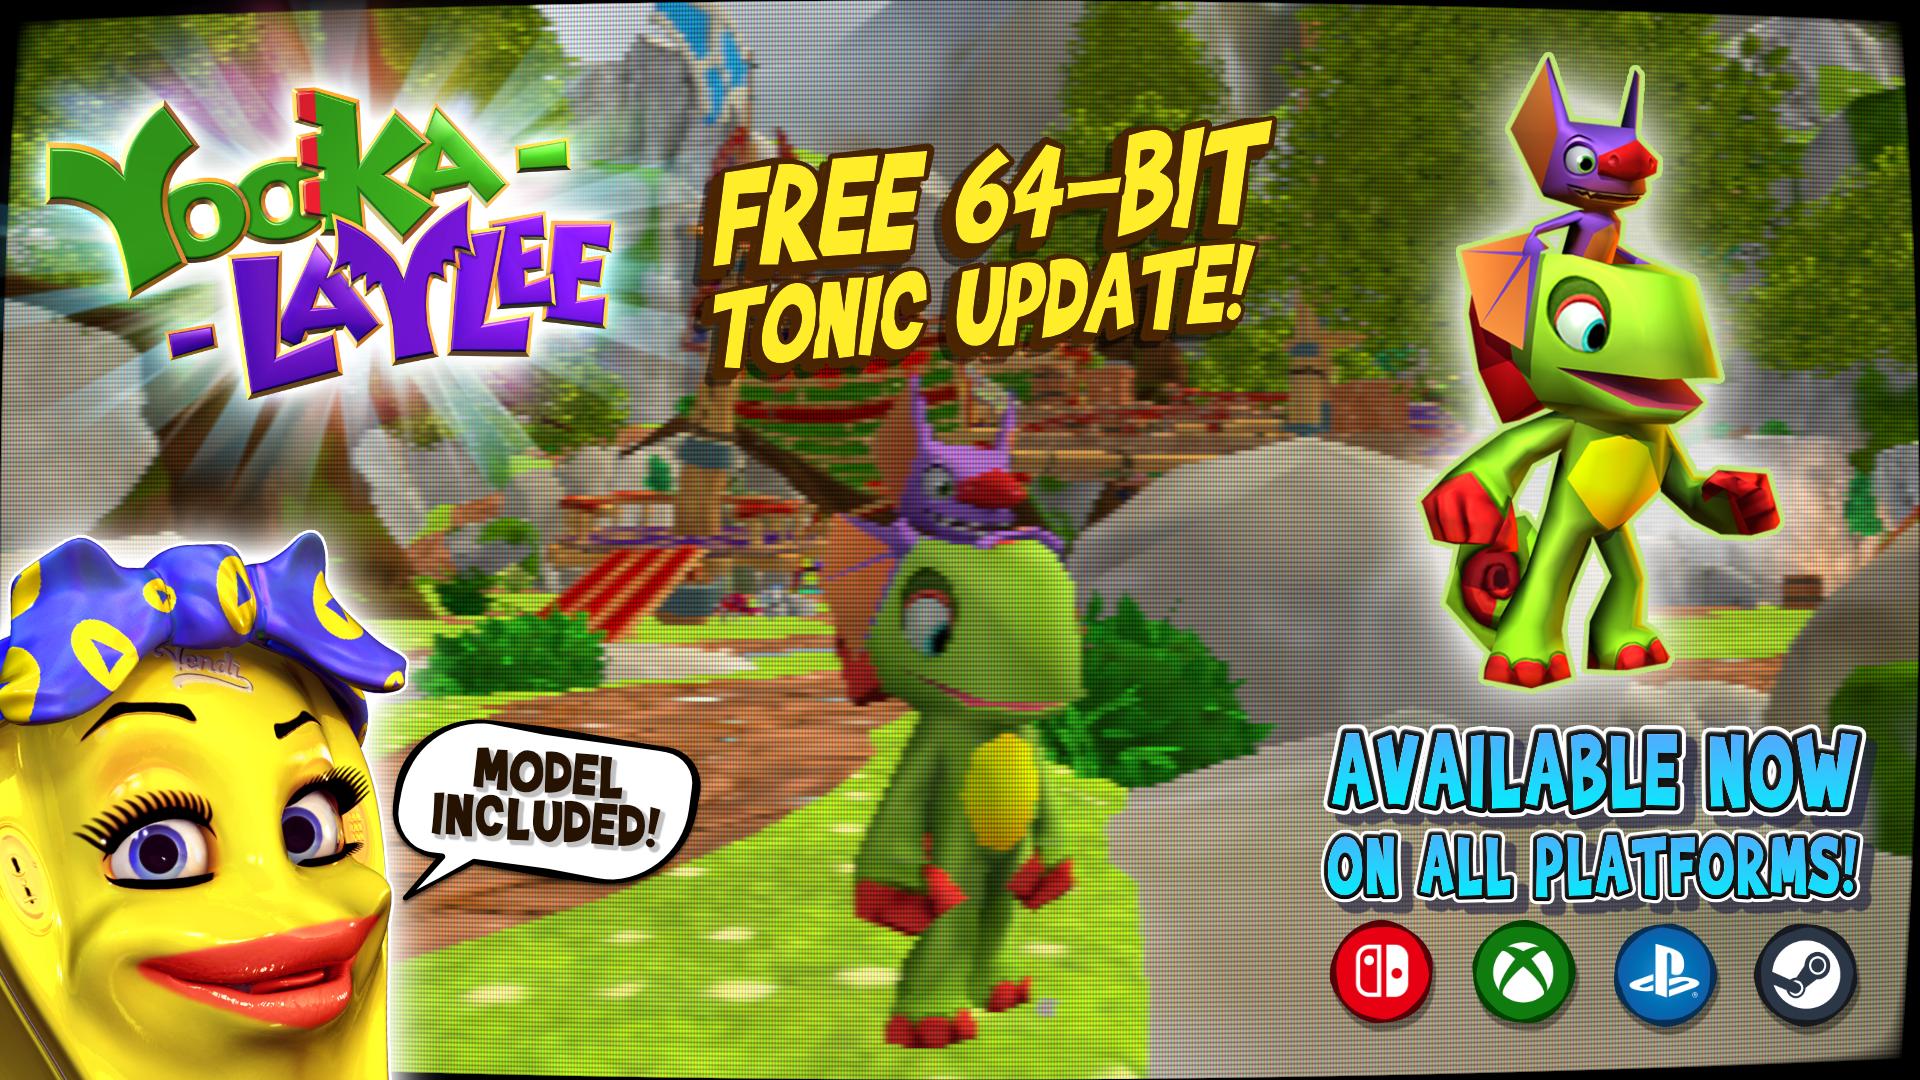 Yooka-Laylee FREE 64-Bit Tonic Update!